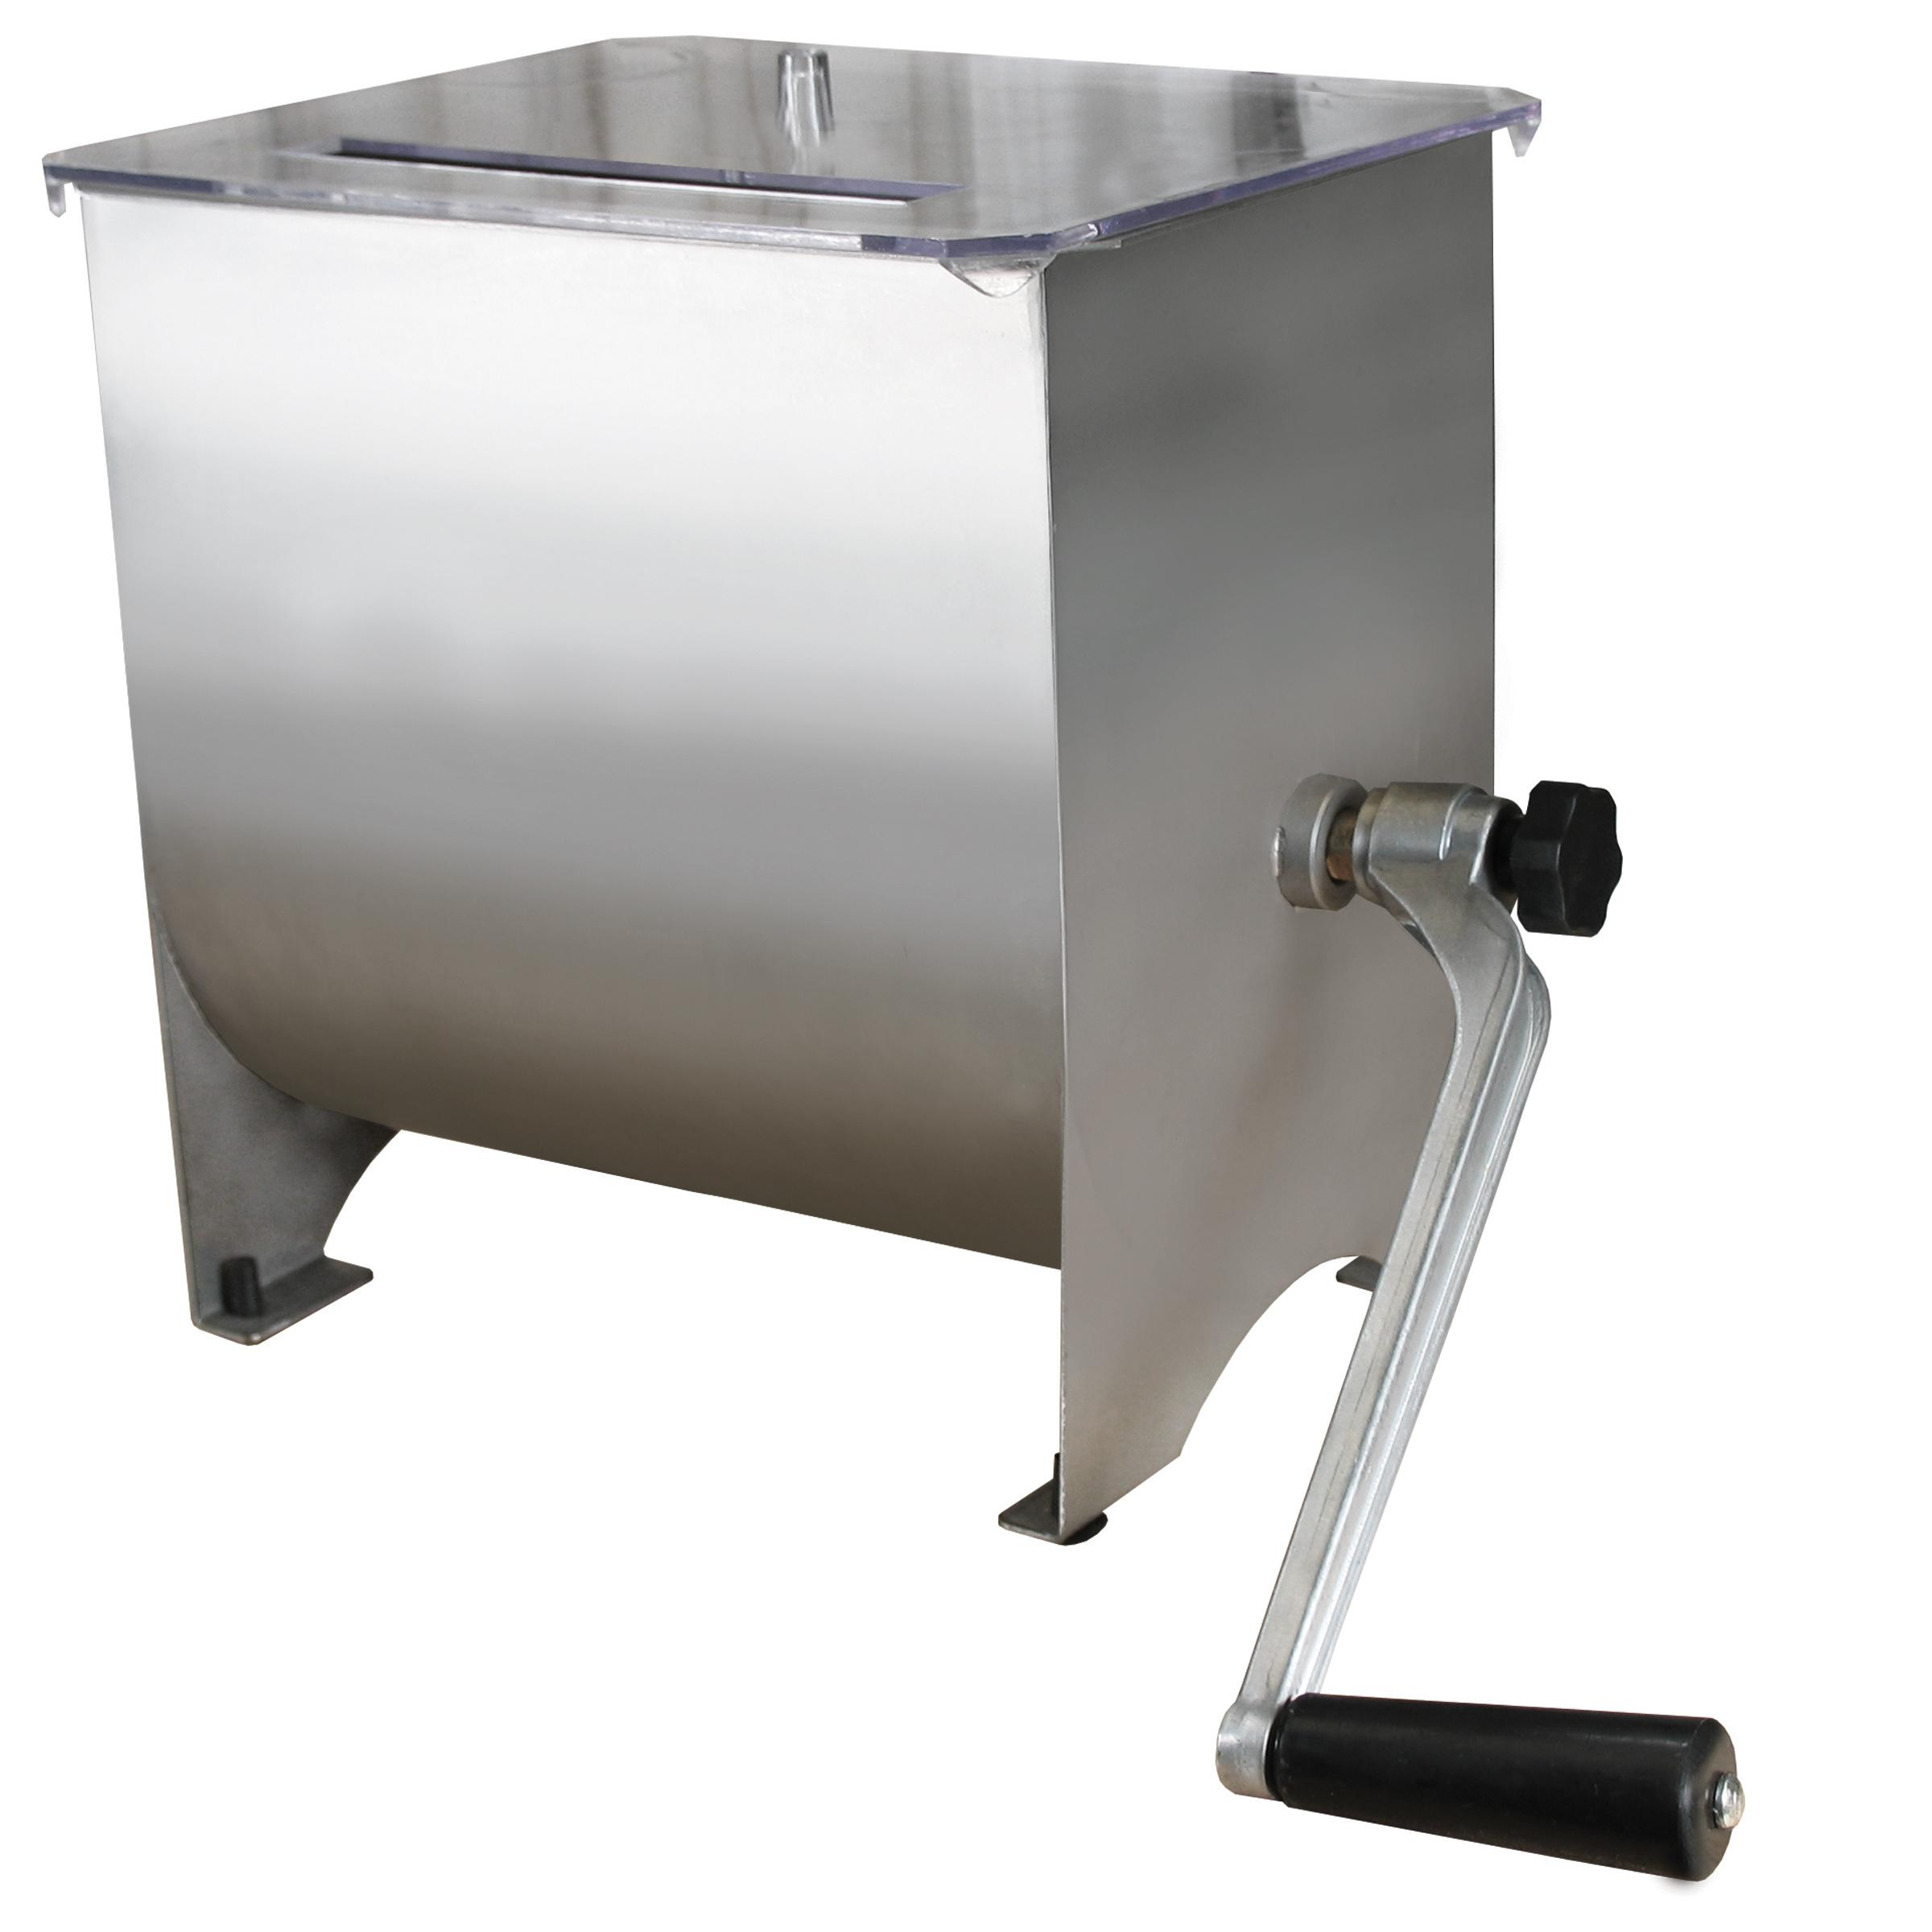 Amazoncom Weston Stainless Steel Meat Mixer 22 Pound  : 76f7c3c0 595d 48e3 a62d 4bec3da440dajpgCB286880406 from www.amazon.com size 2400 x 2400 jpeg 143kB